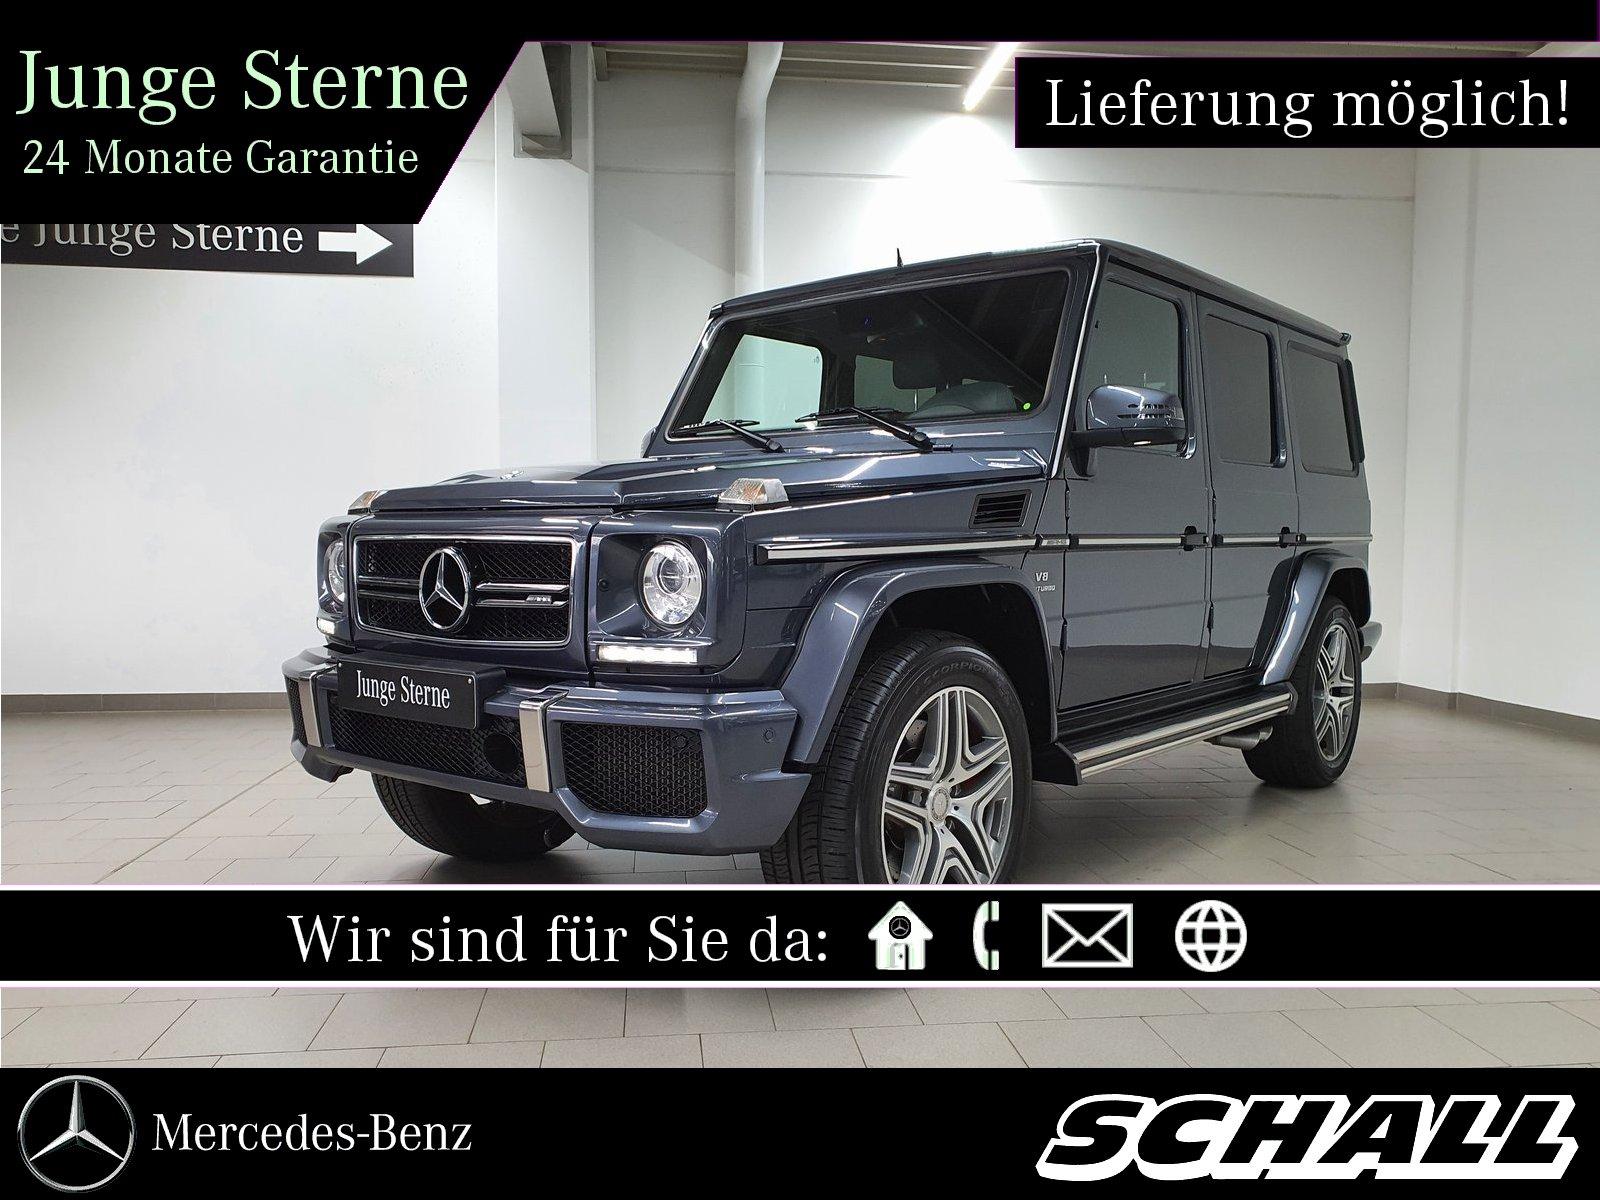 Mercedes-Benz G 63 AMG+DISTR+AHK+H&K+STANDHZ+BI-XENON+KAMERA, Jahr 2016, Benzin